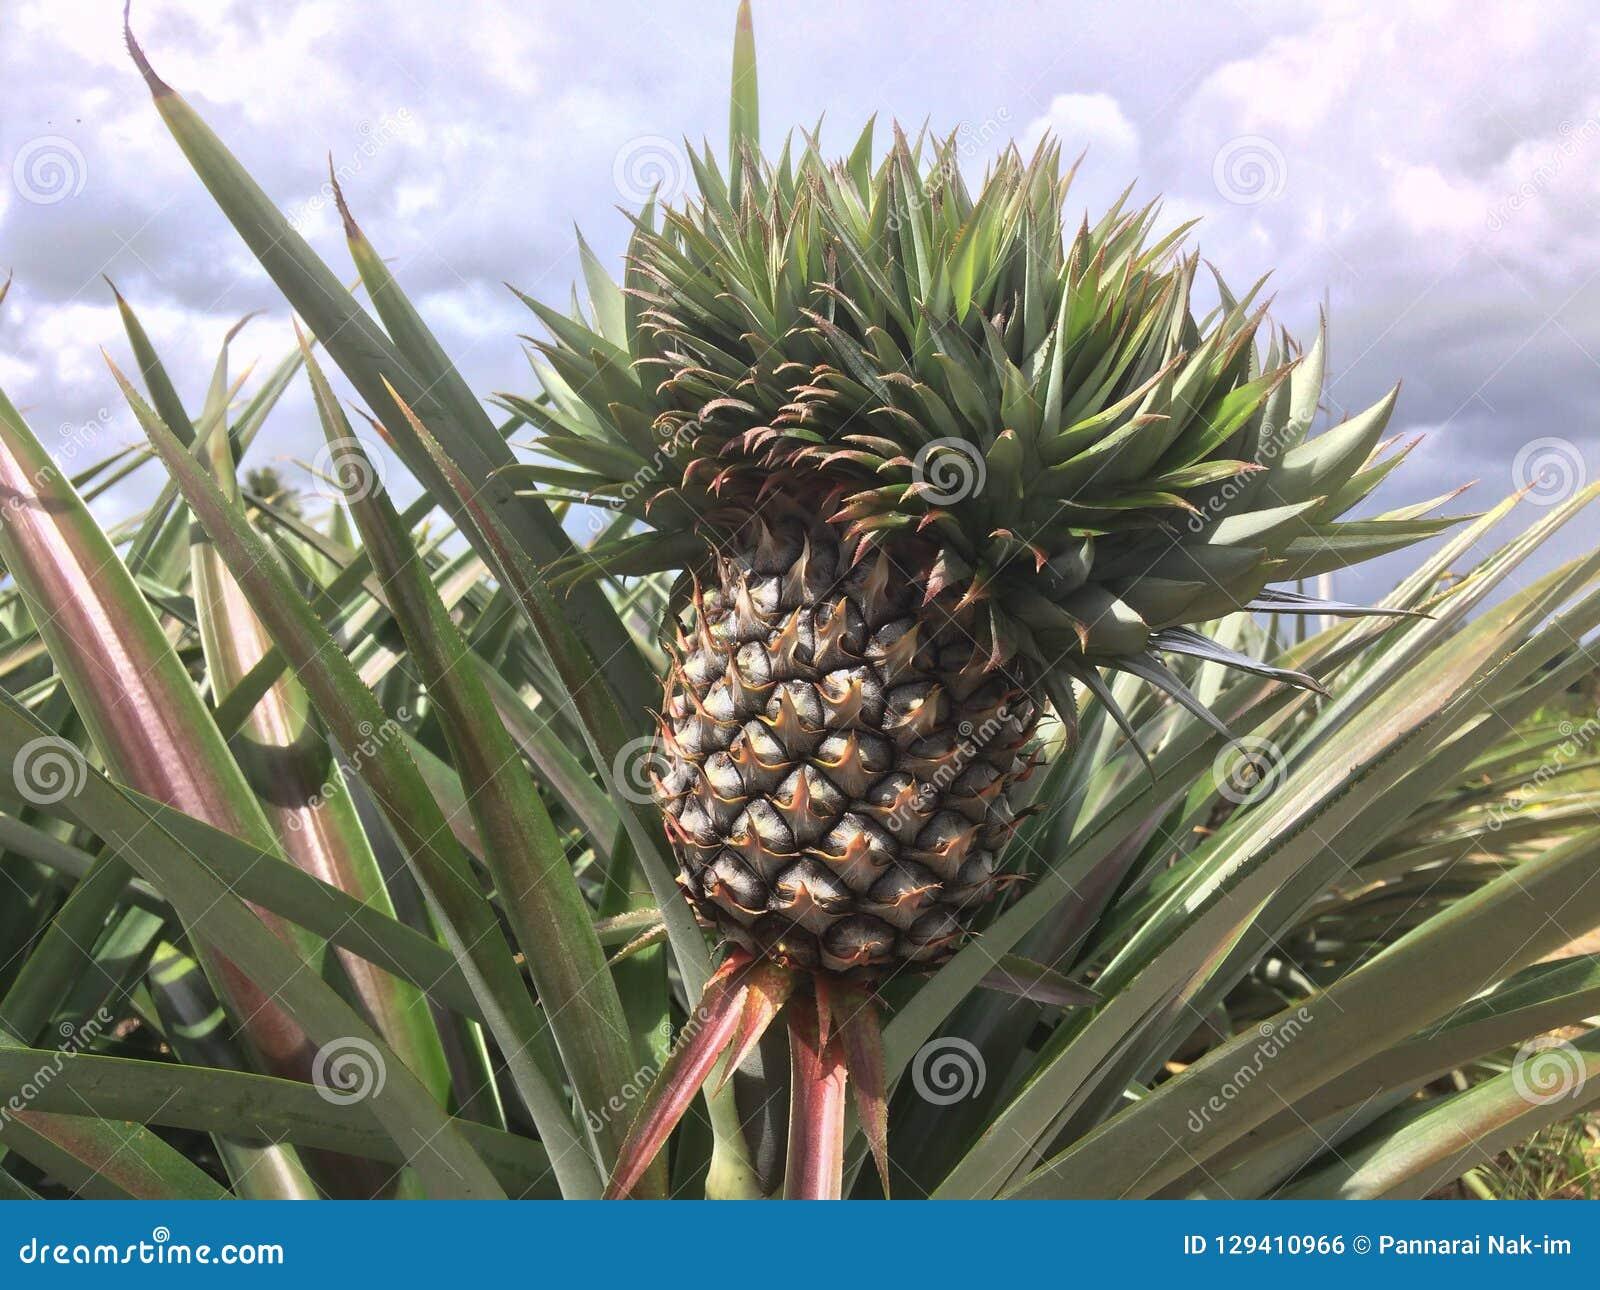 Pineapple on tree in the garden.